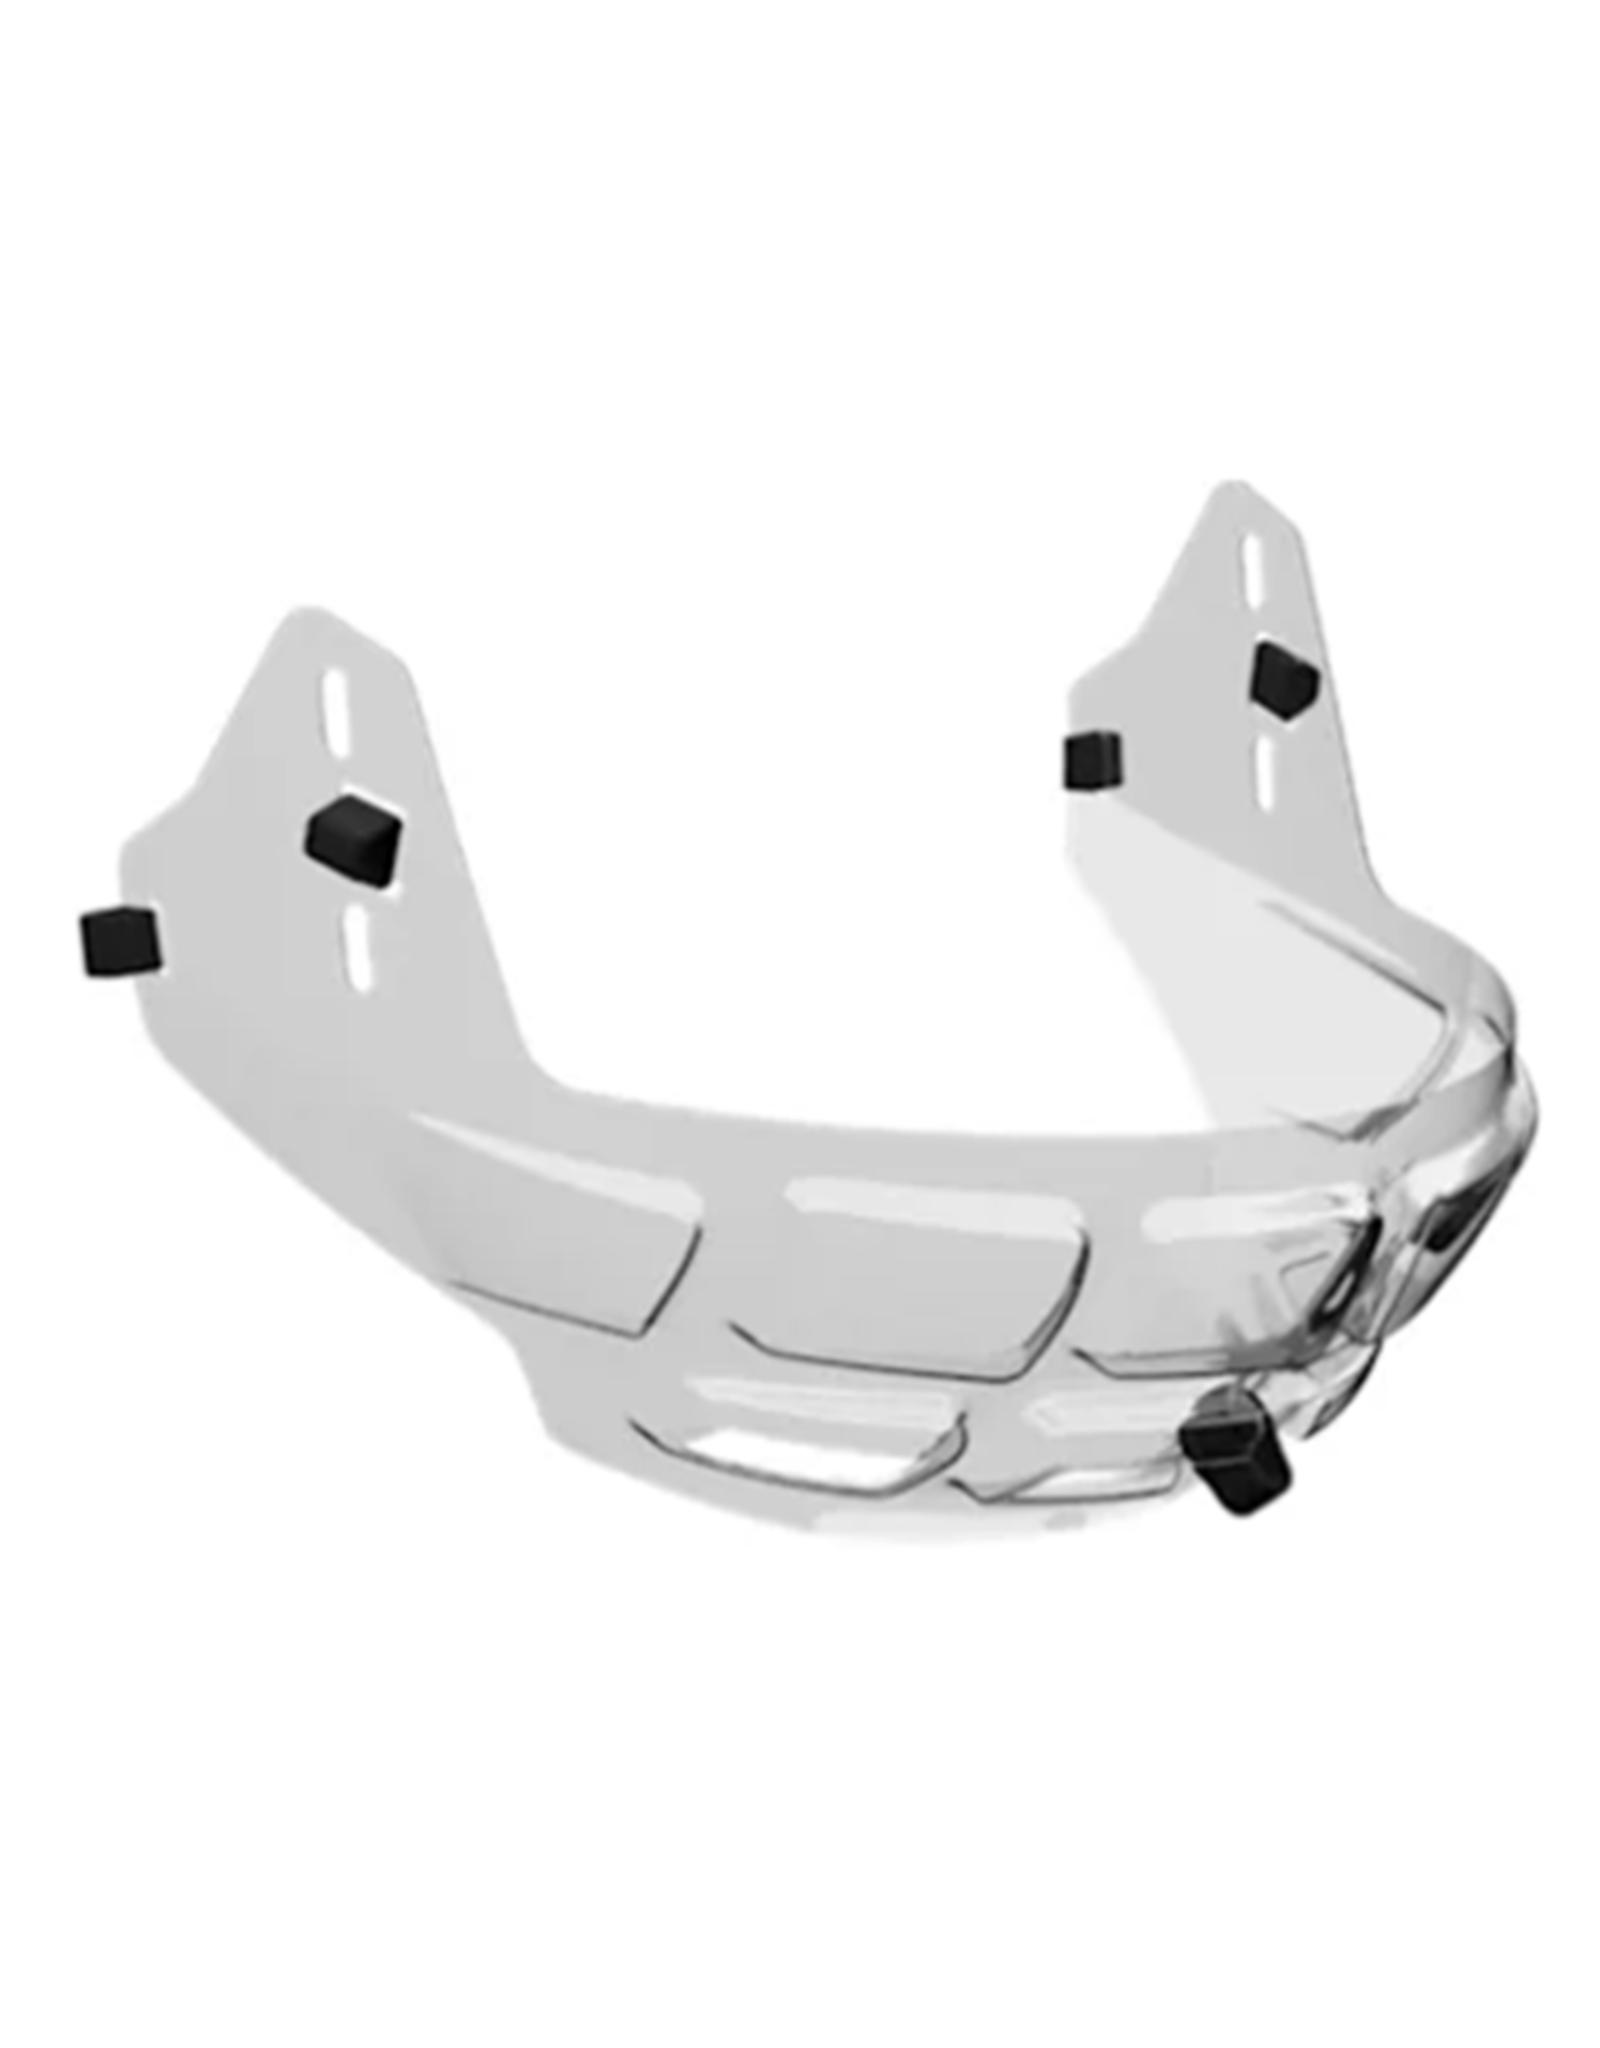 Bauer Concept 3 Junior Splash Guard 2 pk